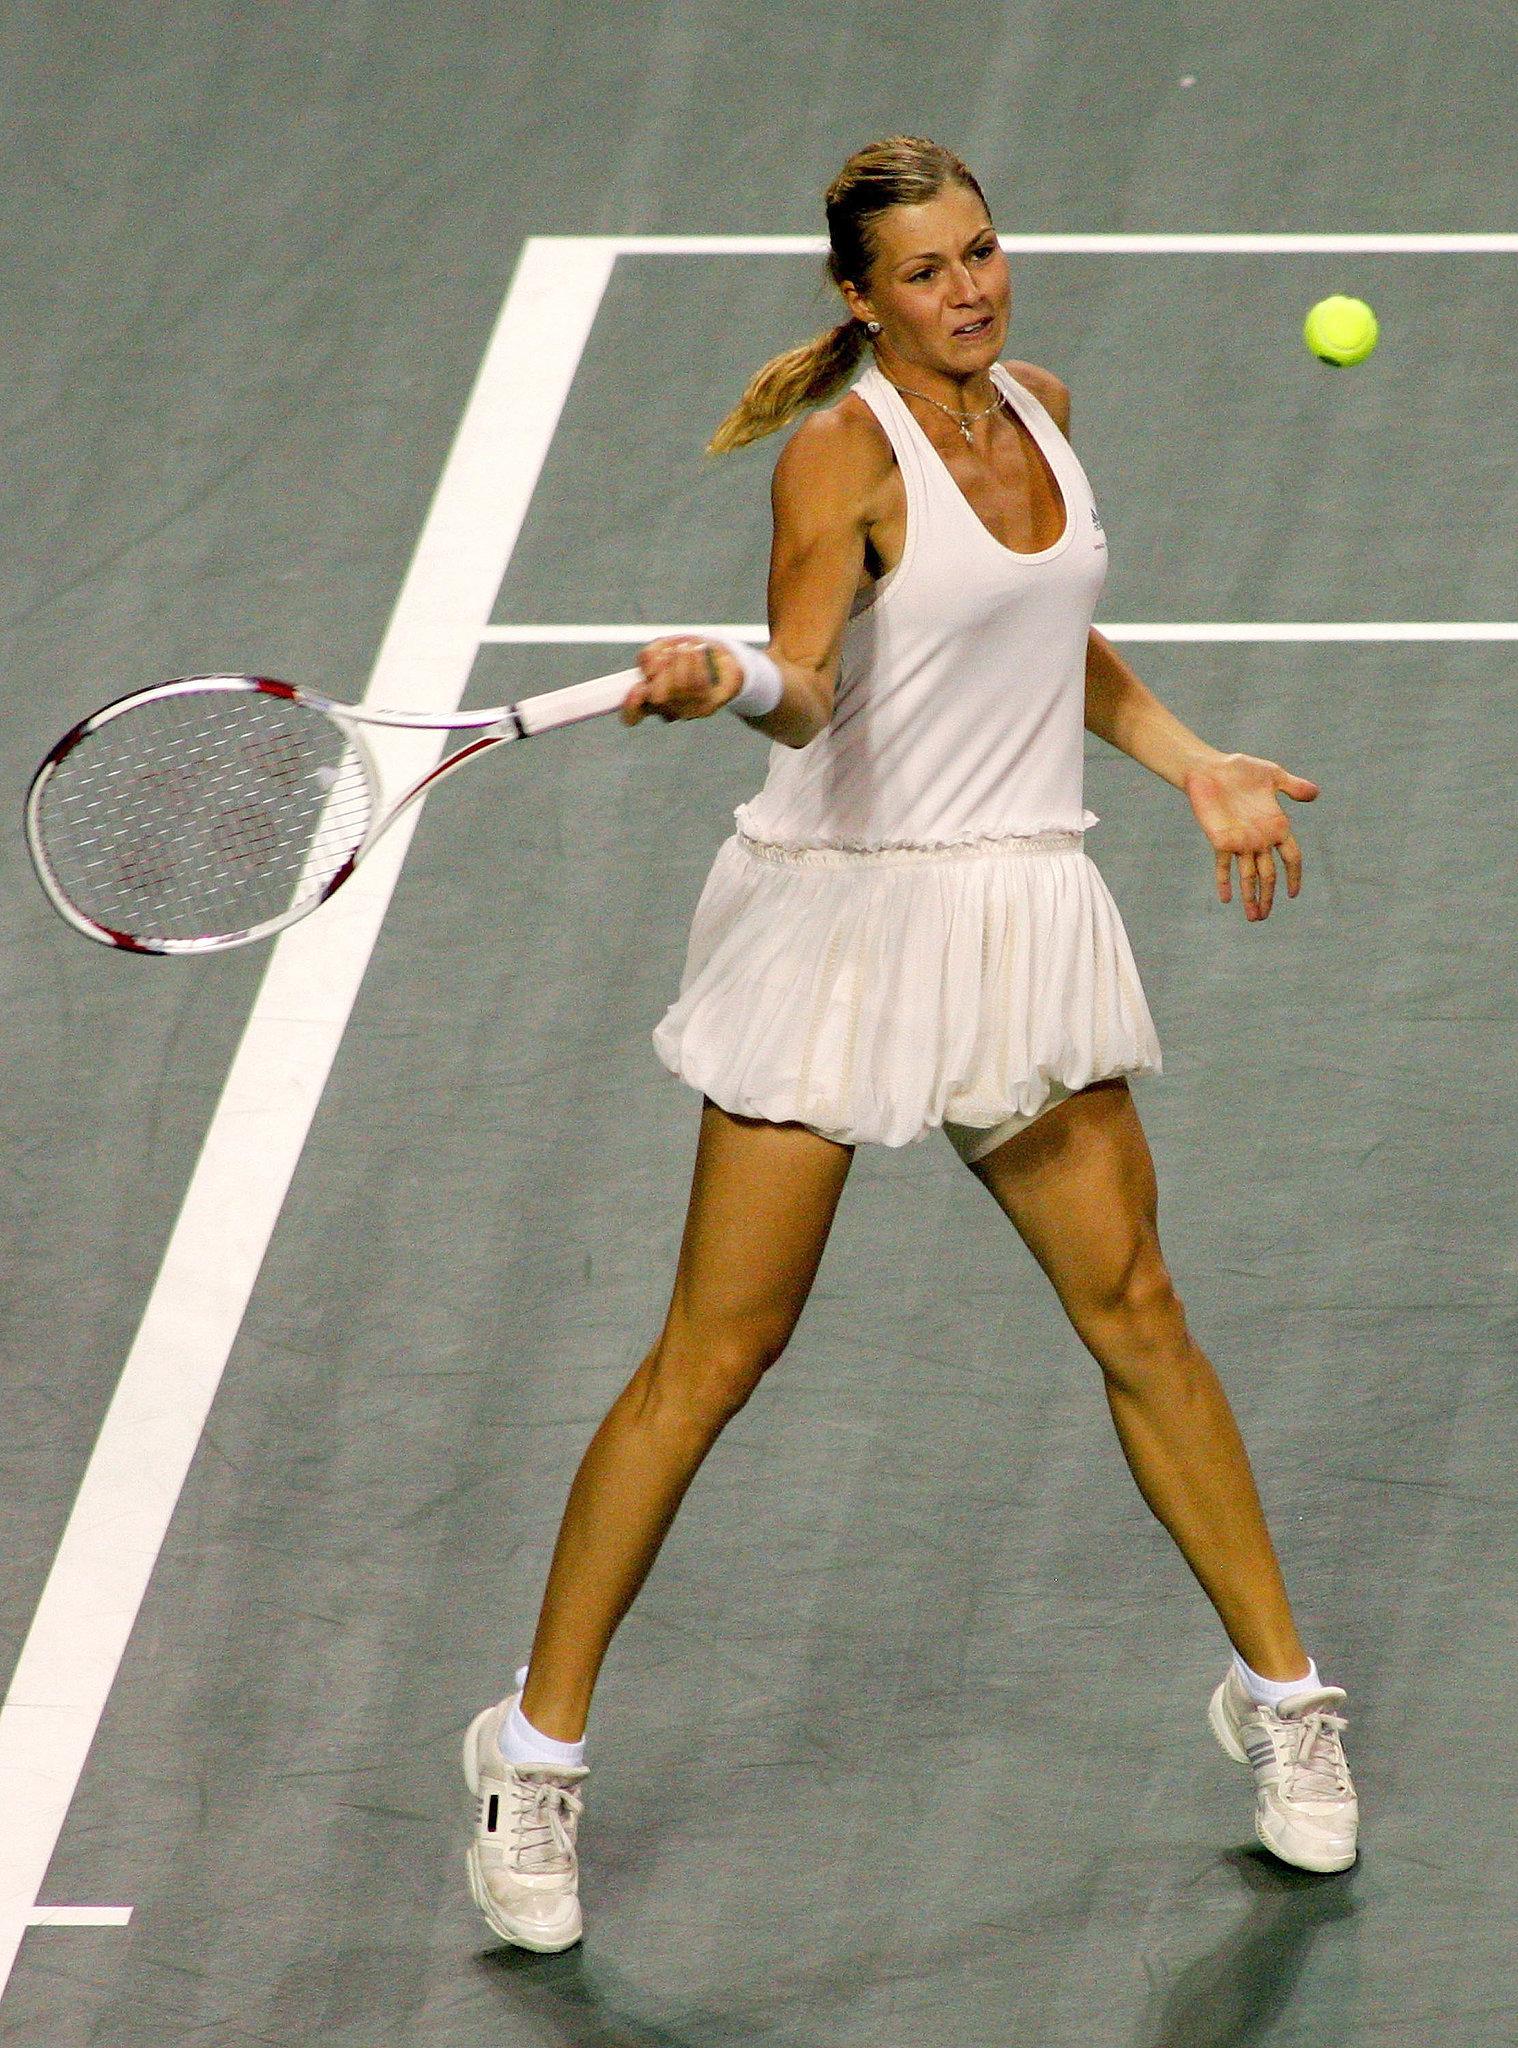 Tennis babe Maria Kirilenko brought fashion to the tennis court in her tutu-inspired dress.